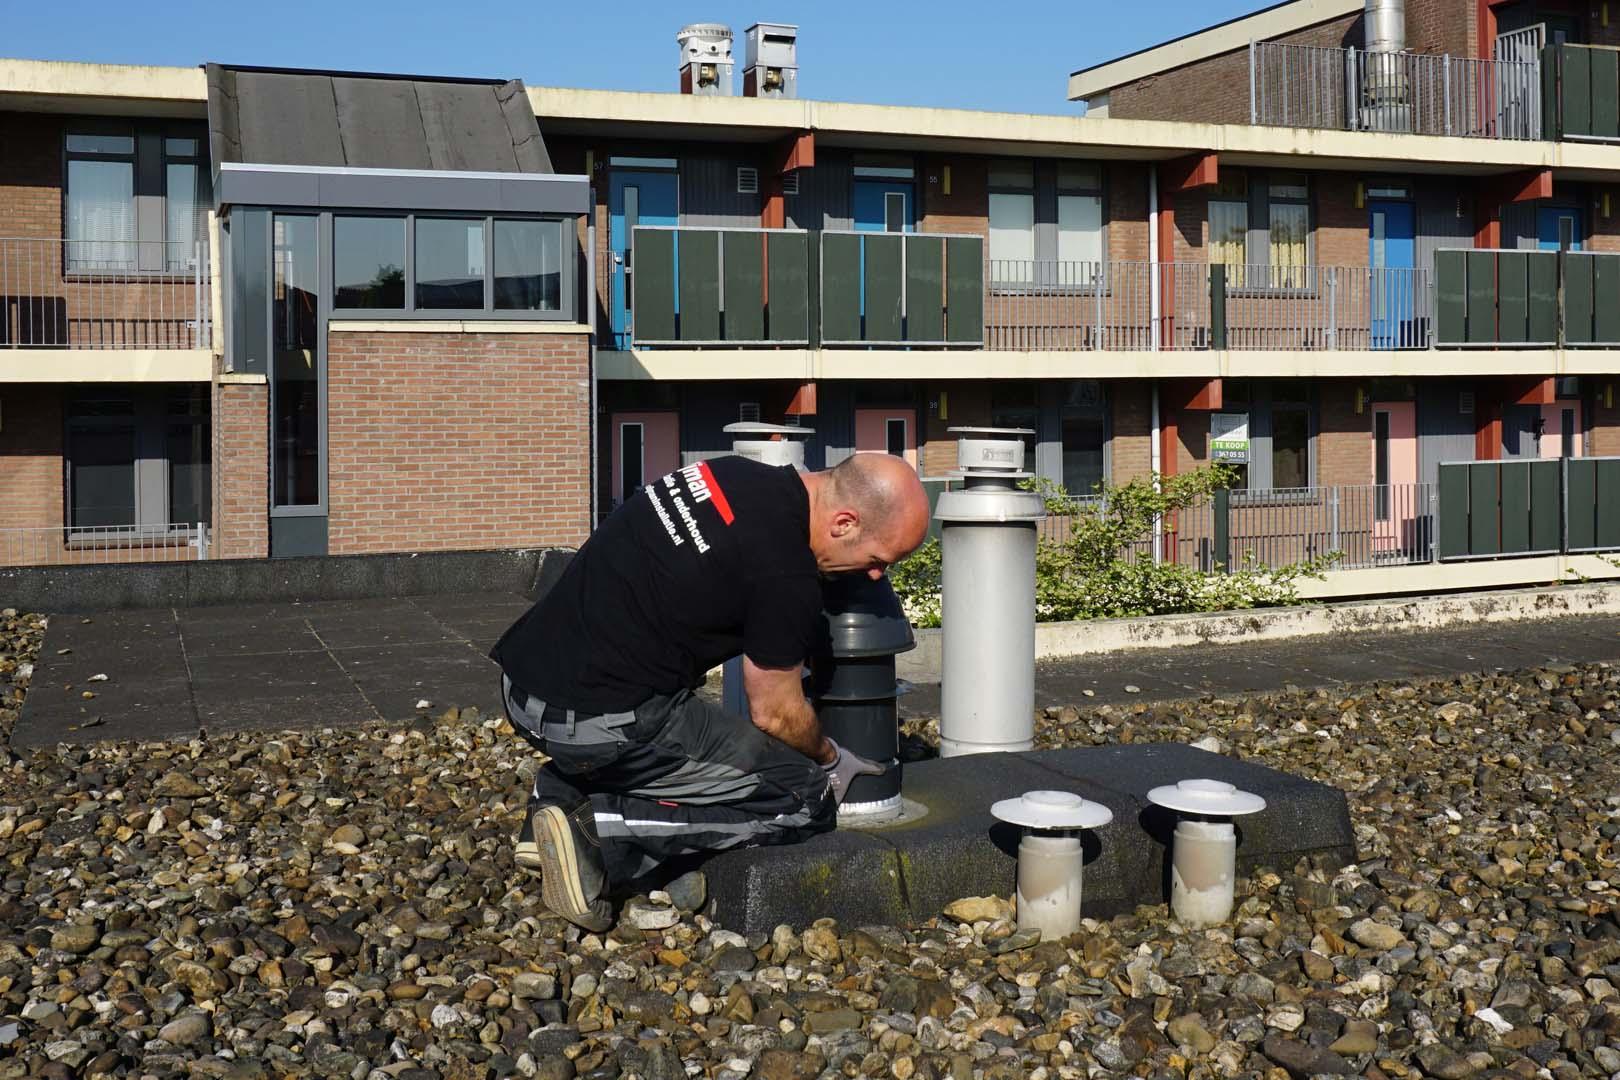 nijman cv ketel installateur zoetermeer